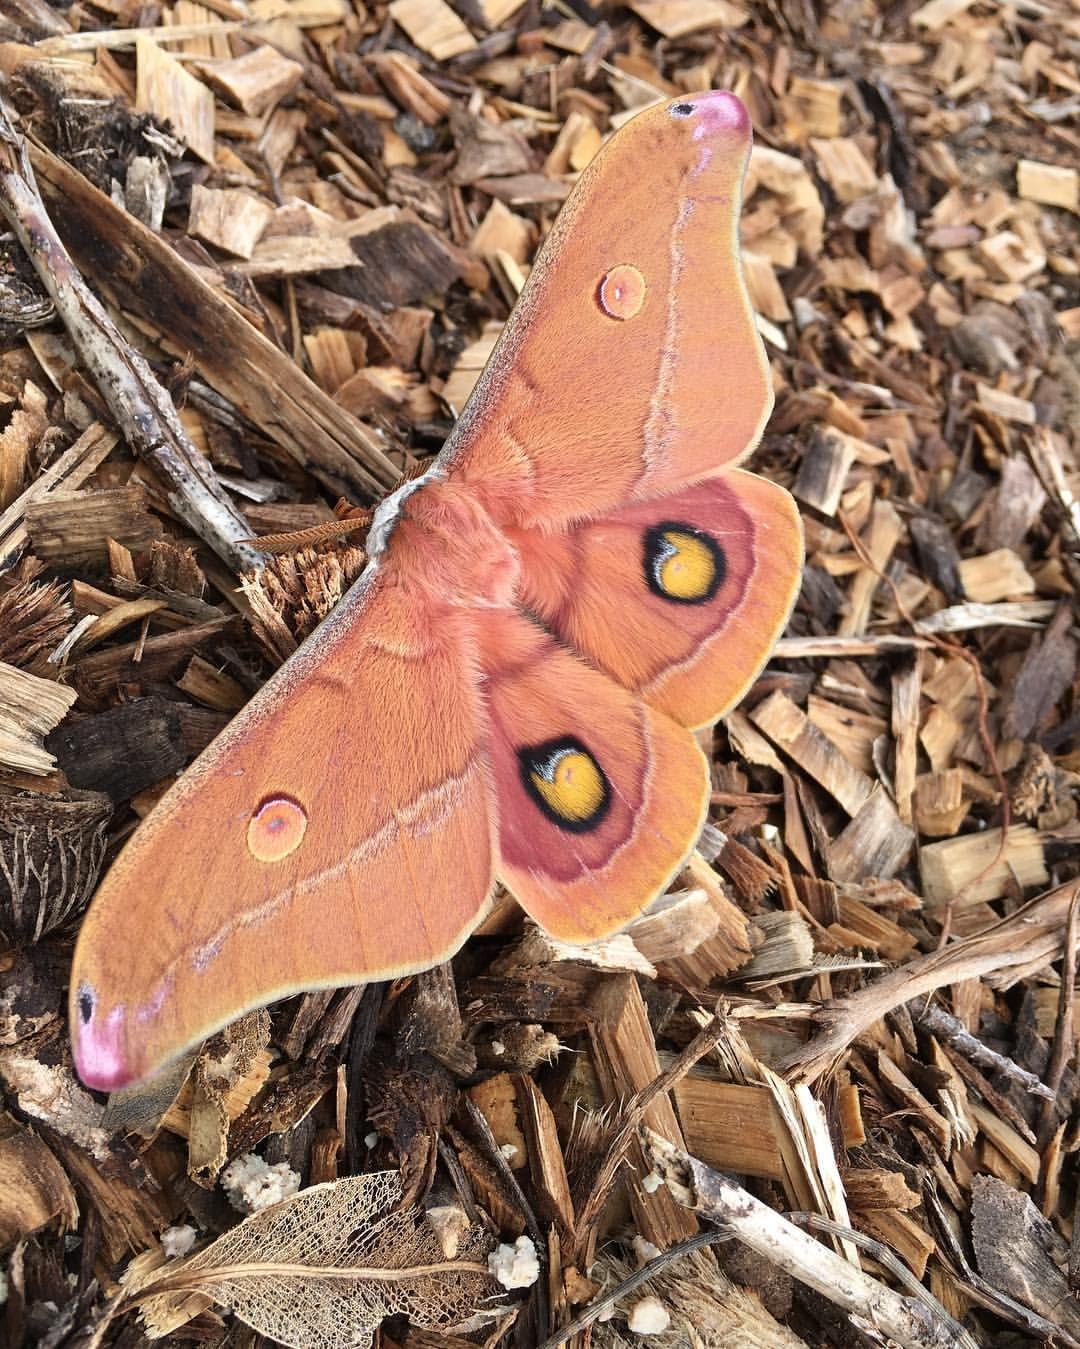 Emperor Gum Moth | Moth tattoo meaning, Moth symbolism ...